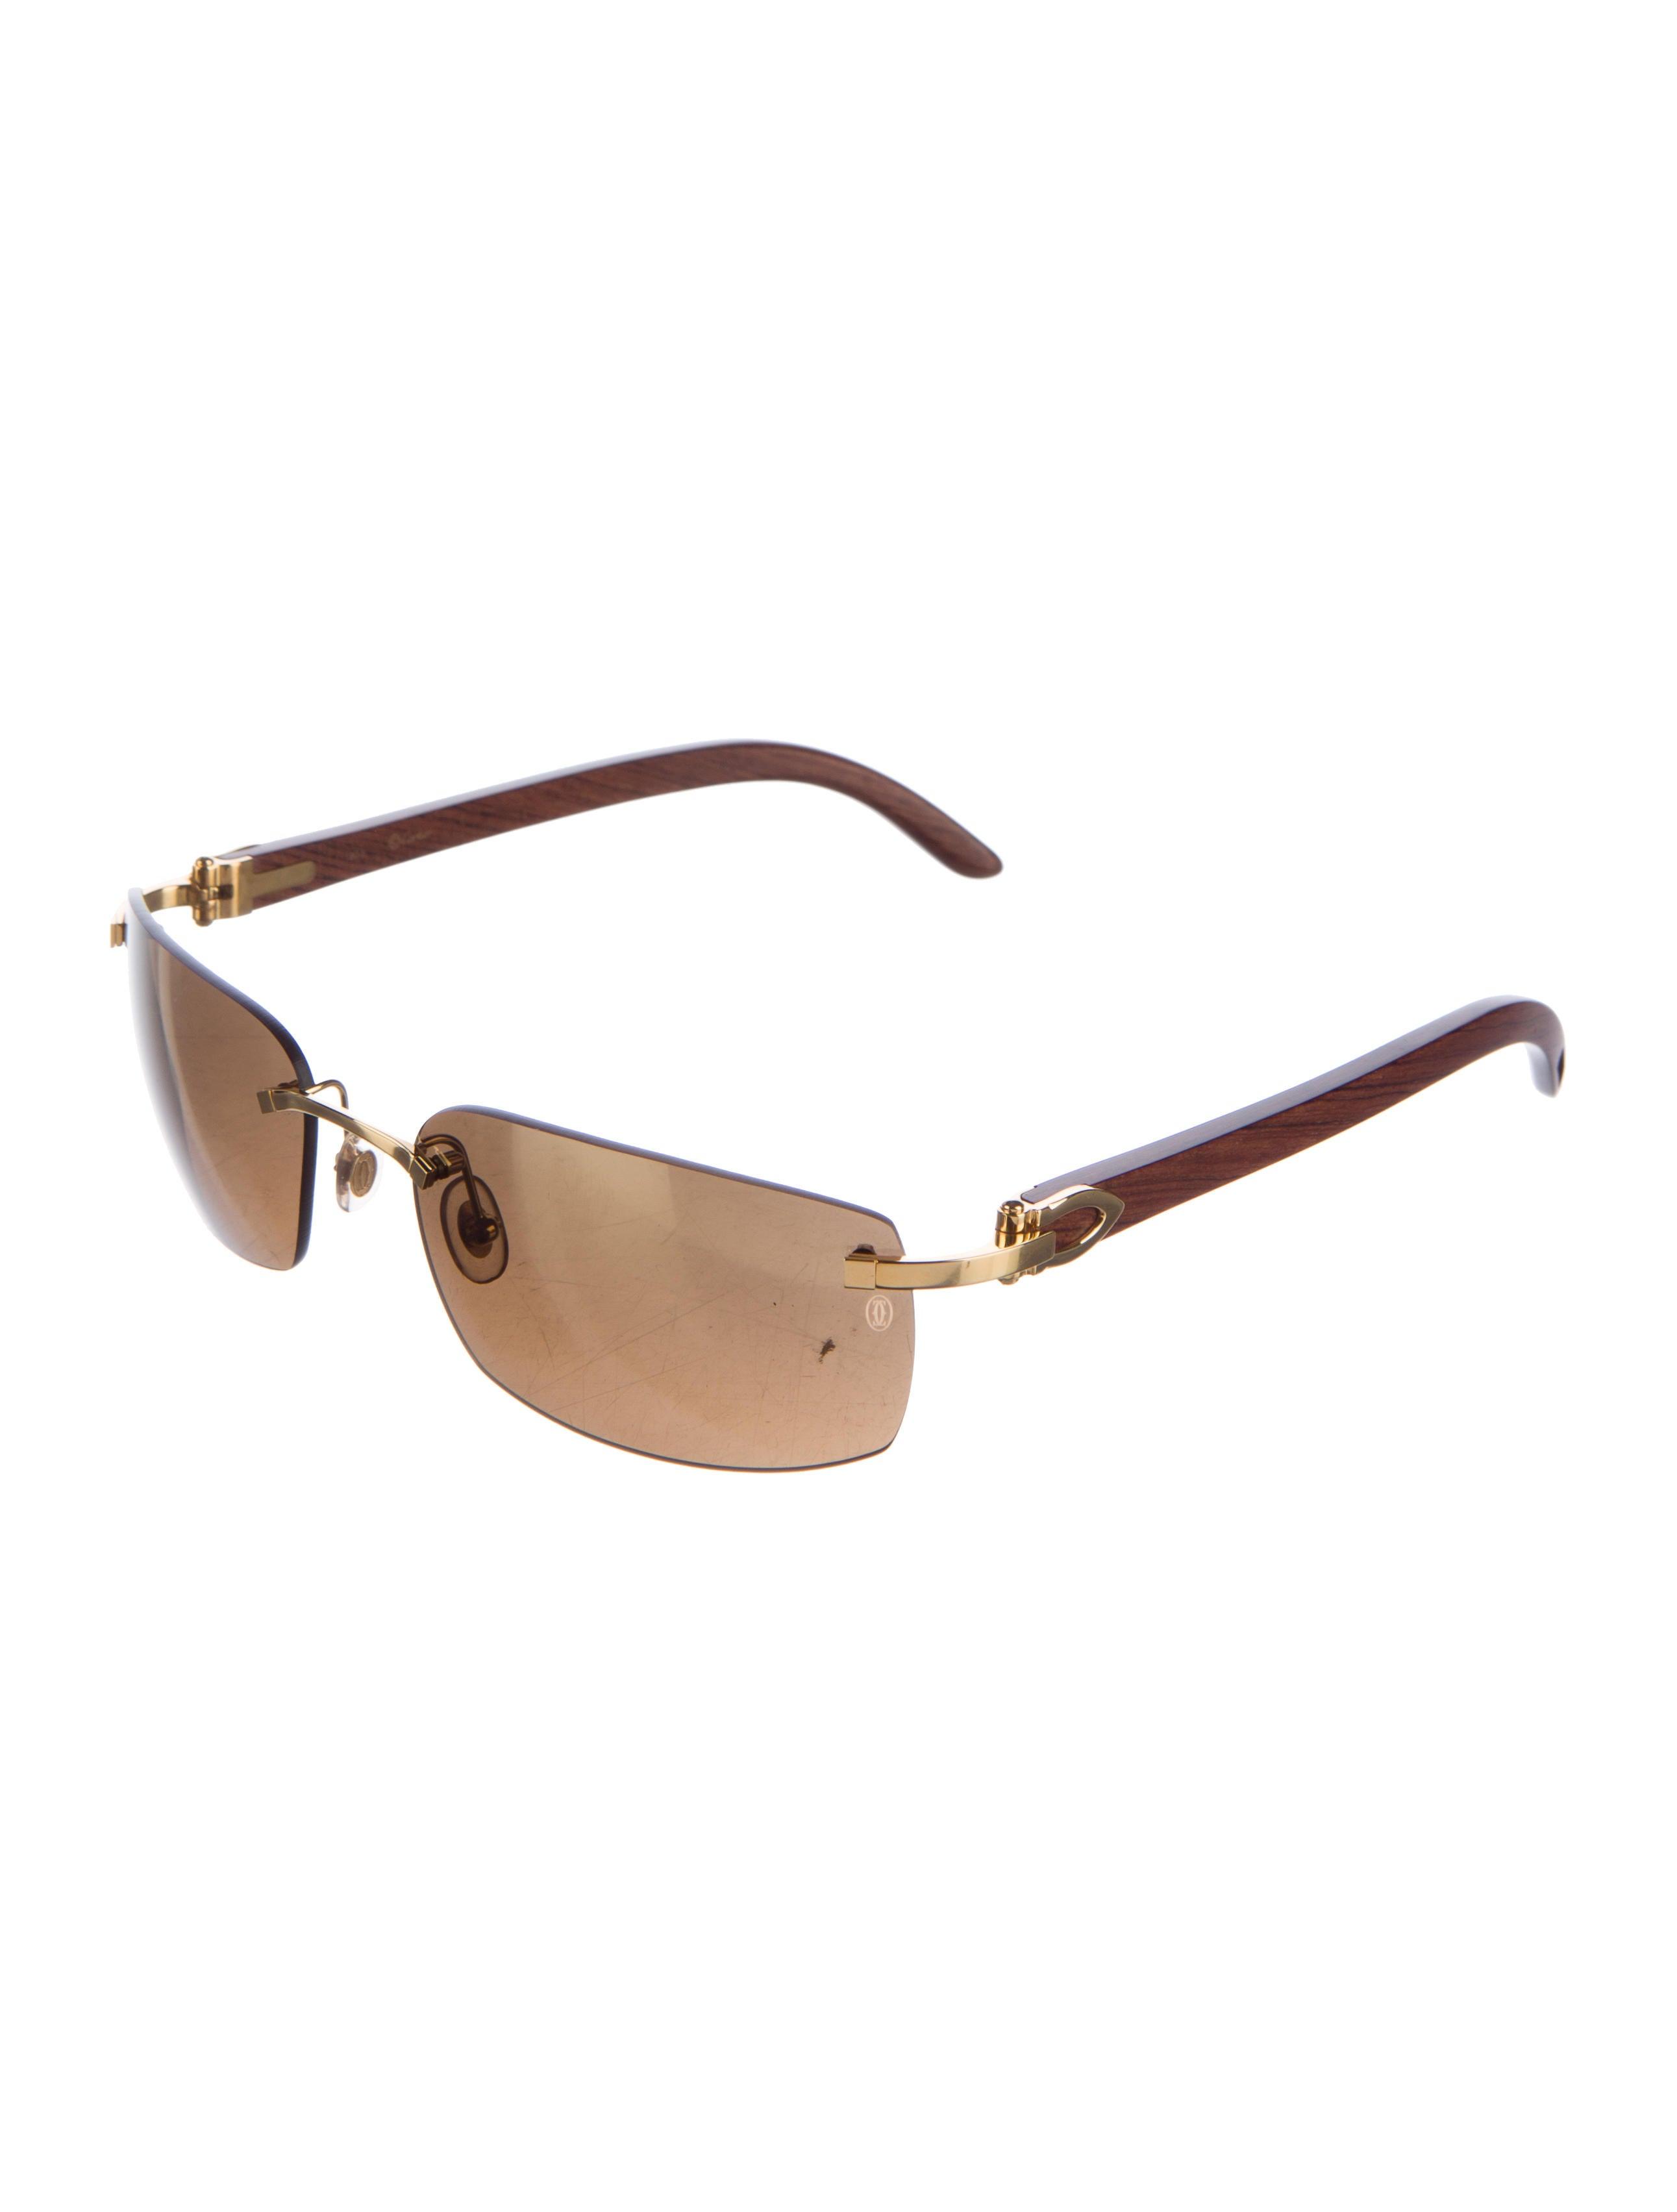 cartier decor c gold-plated sunglasses - accessories - crt30537